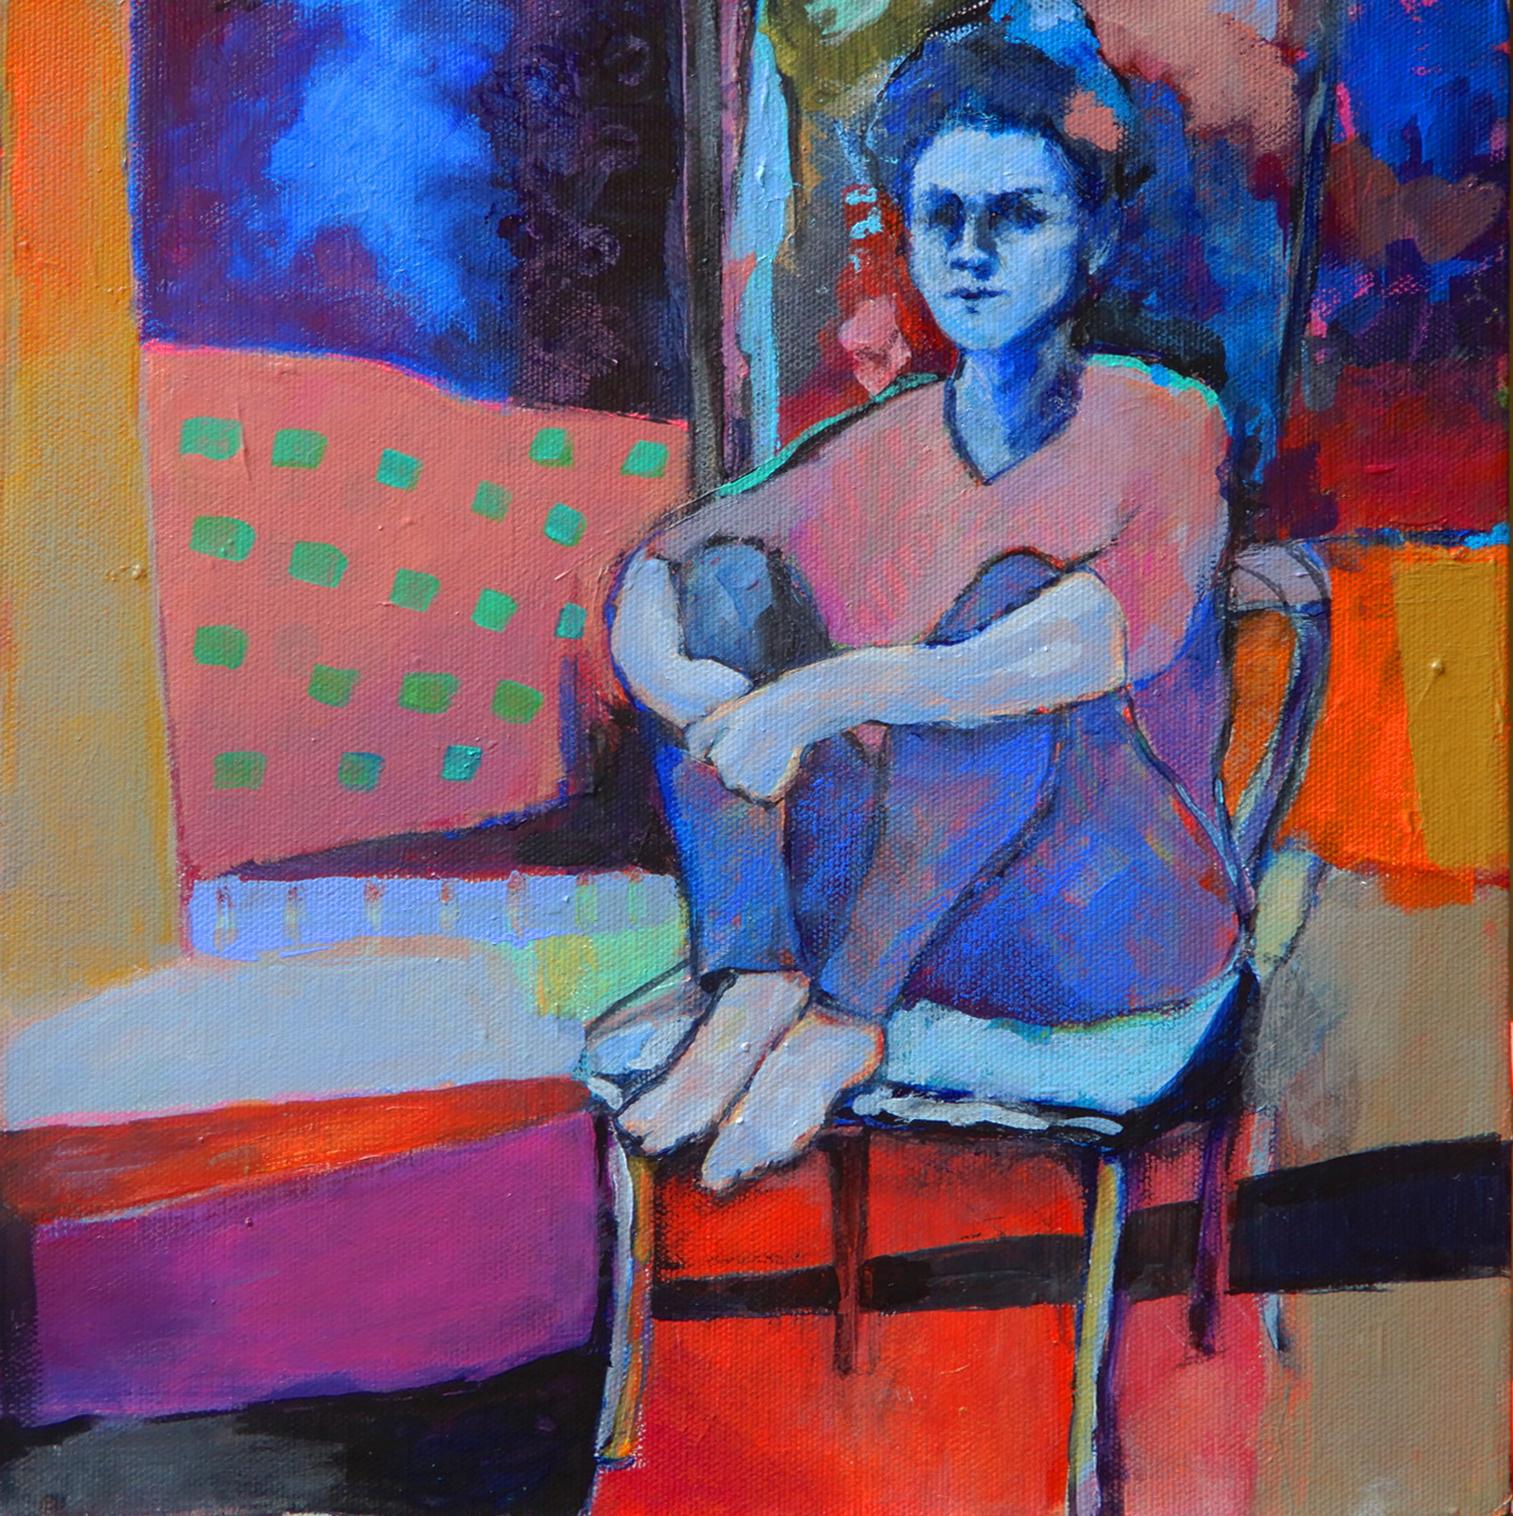 Rosa Vera_Passages II_2018_Acrylic on canvas_12_ x 12__$350.jpg